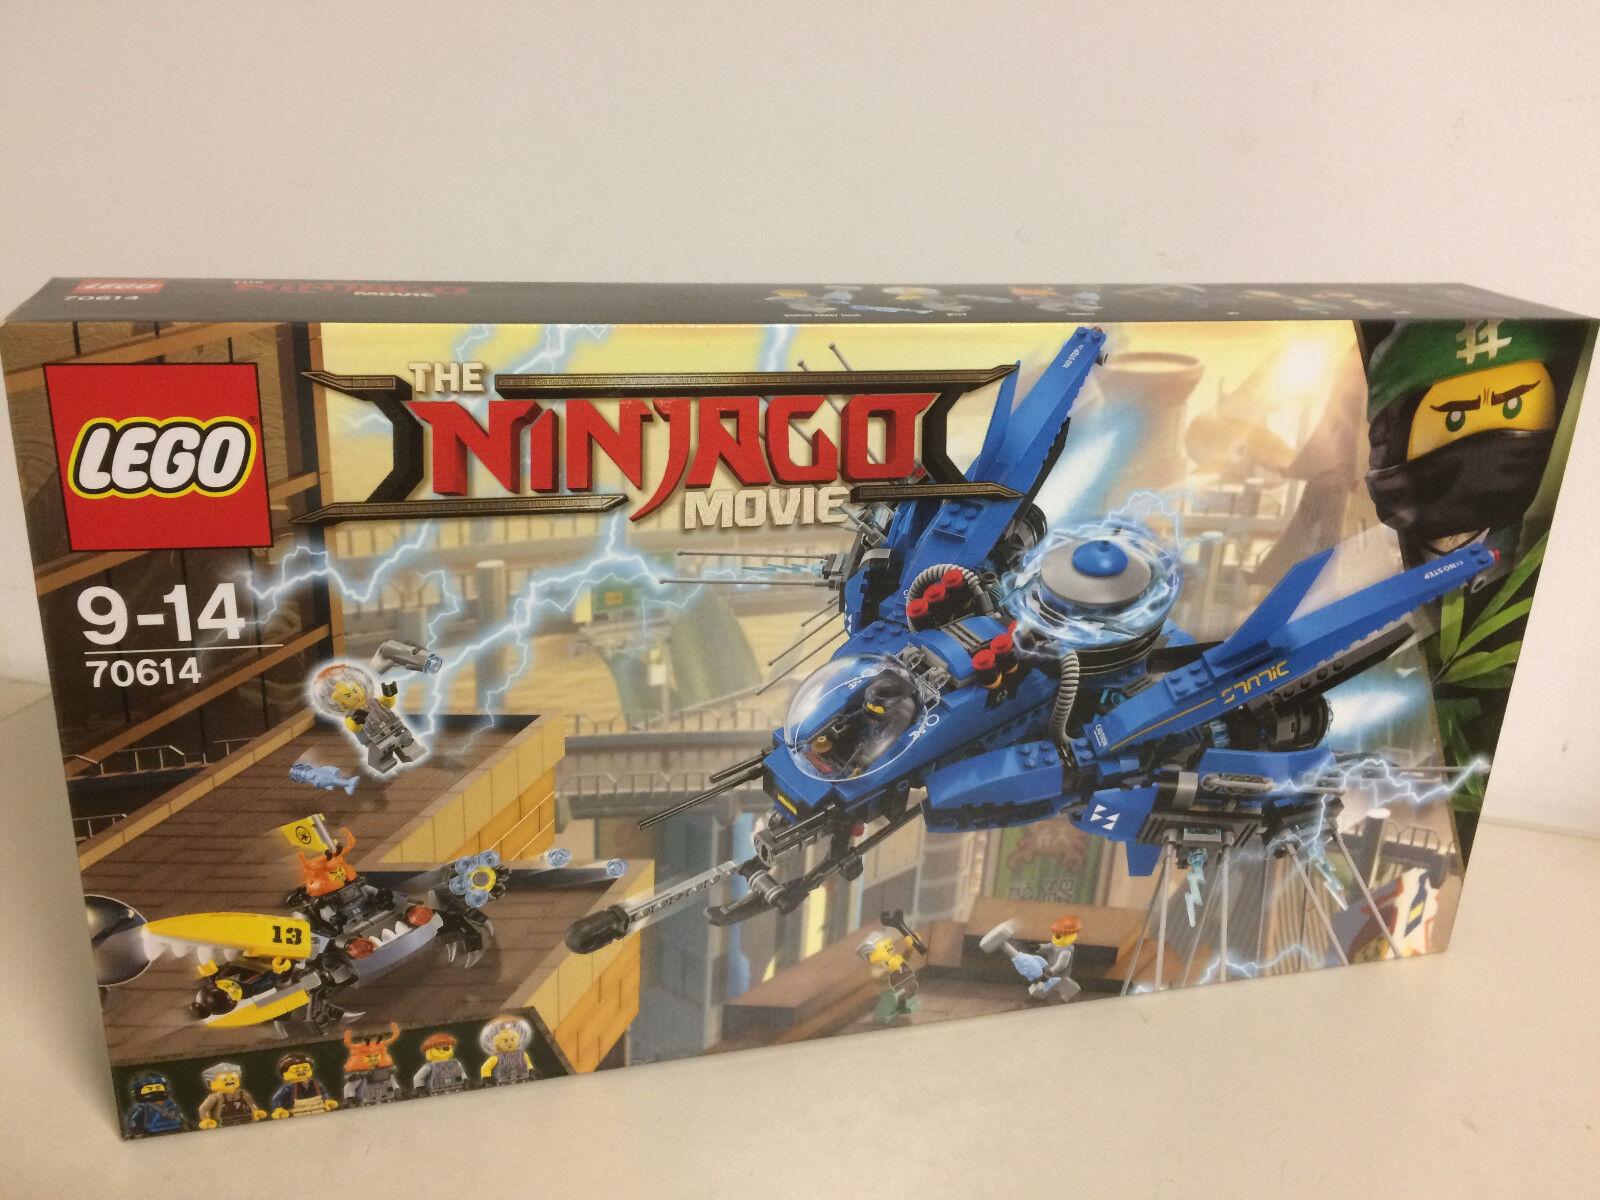 LEGO THE NINJAGO MOVIE 70614 LIGHTNING JET JET JET    6 minifigures Jelly  Shark Army dbc169